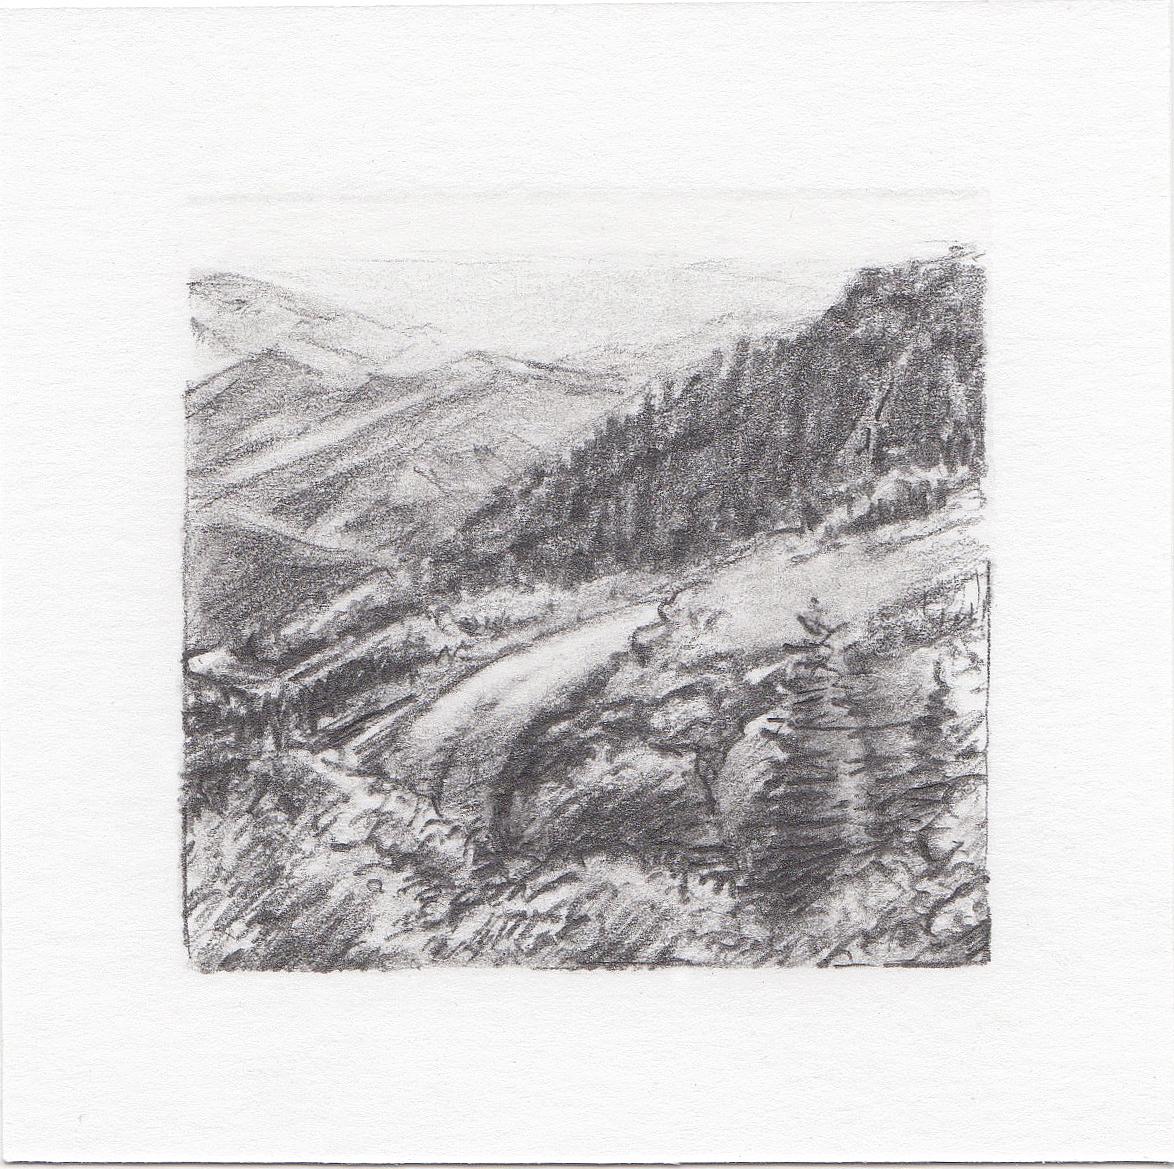 #49 Big Mountain, Utah | 3x3 | graphite